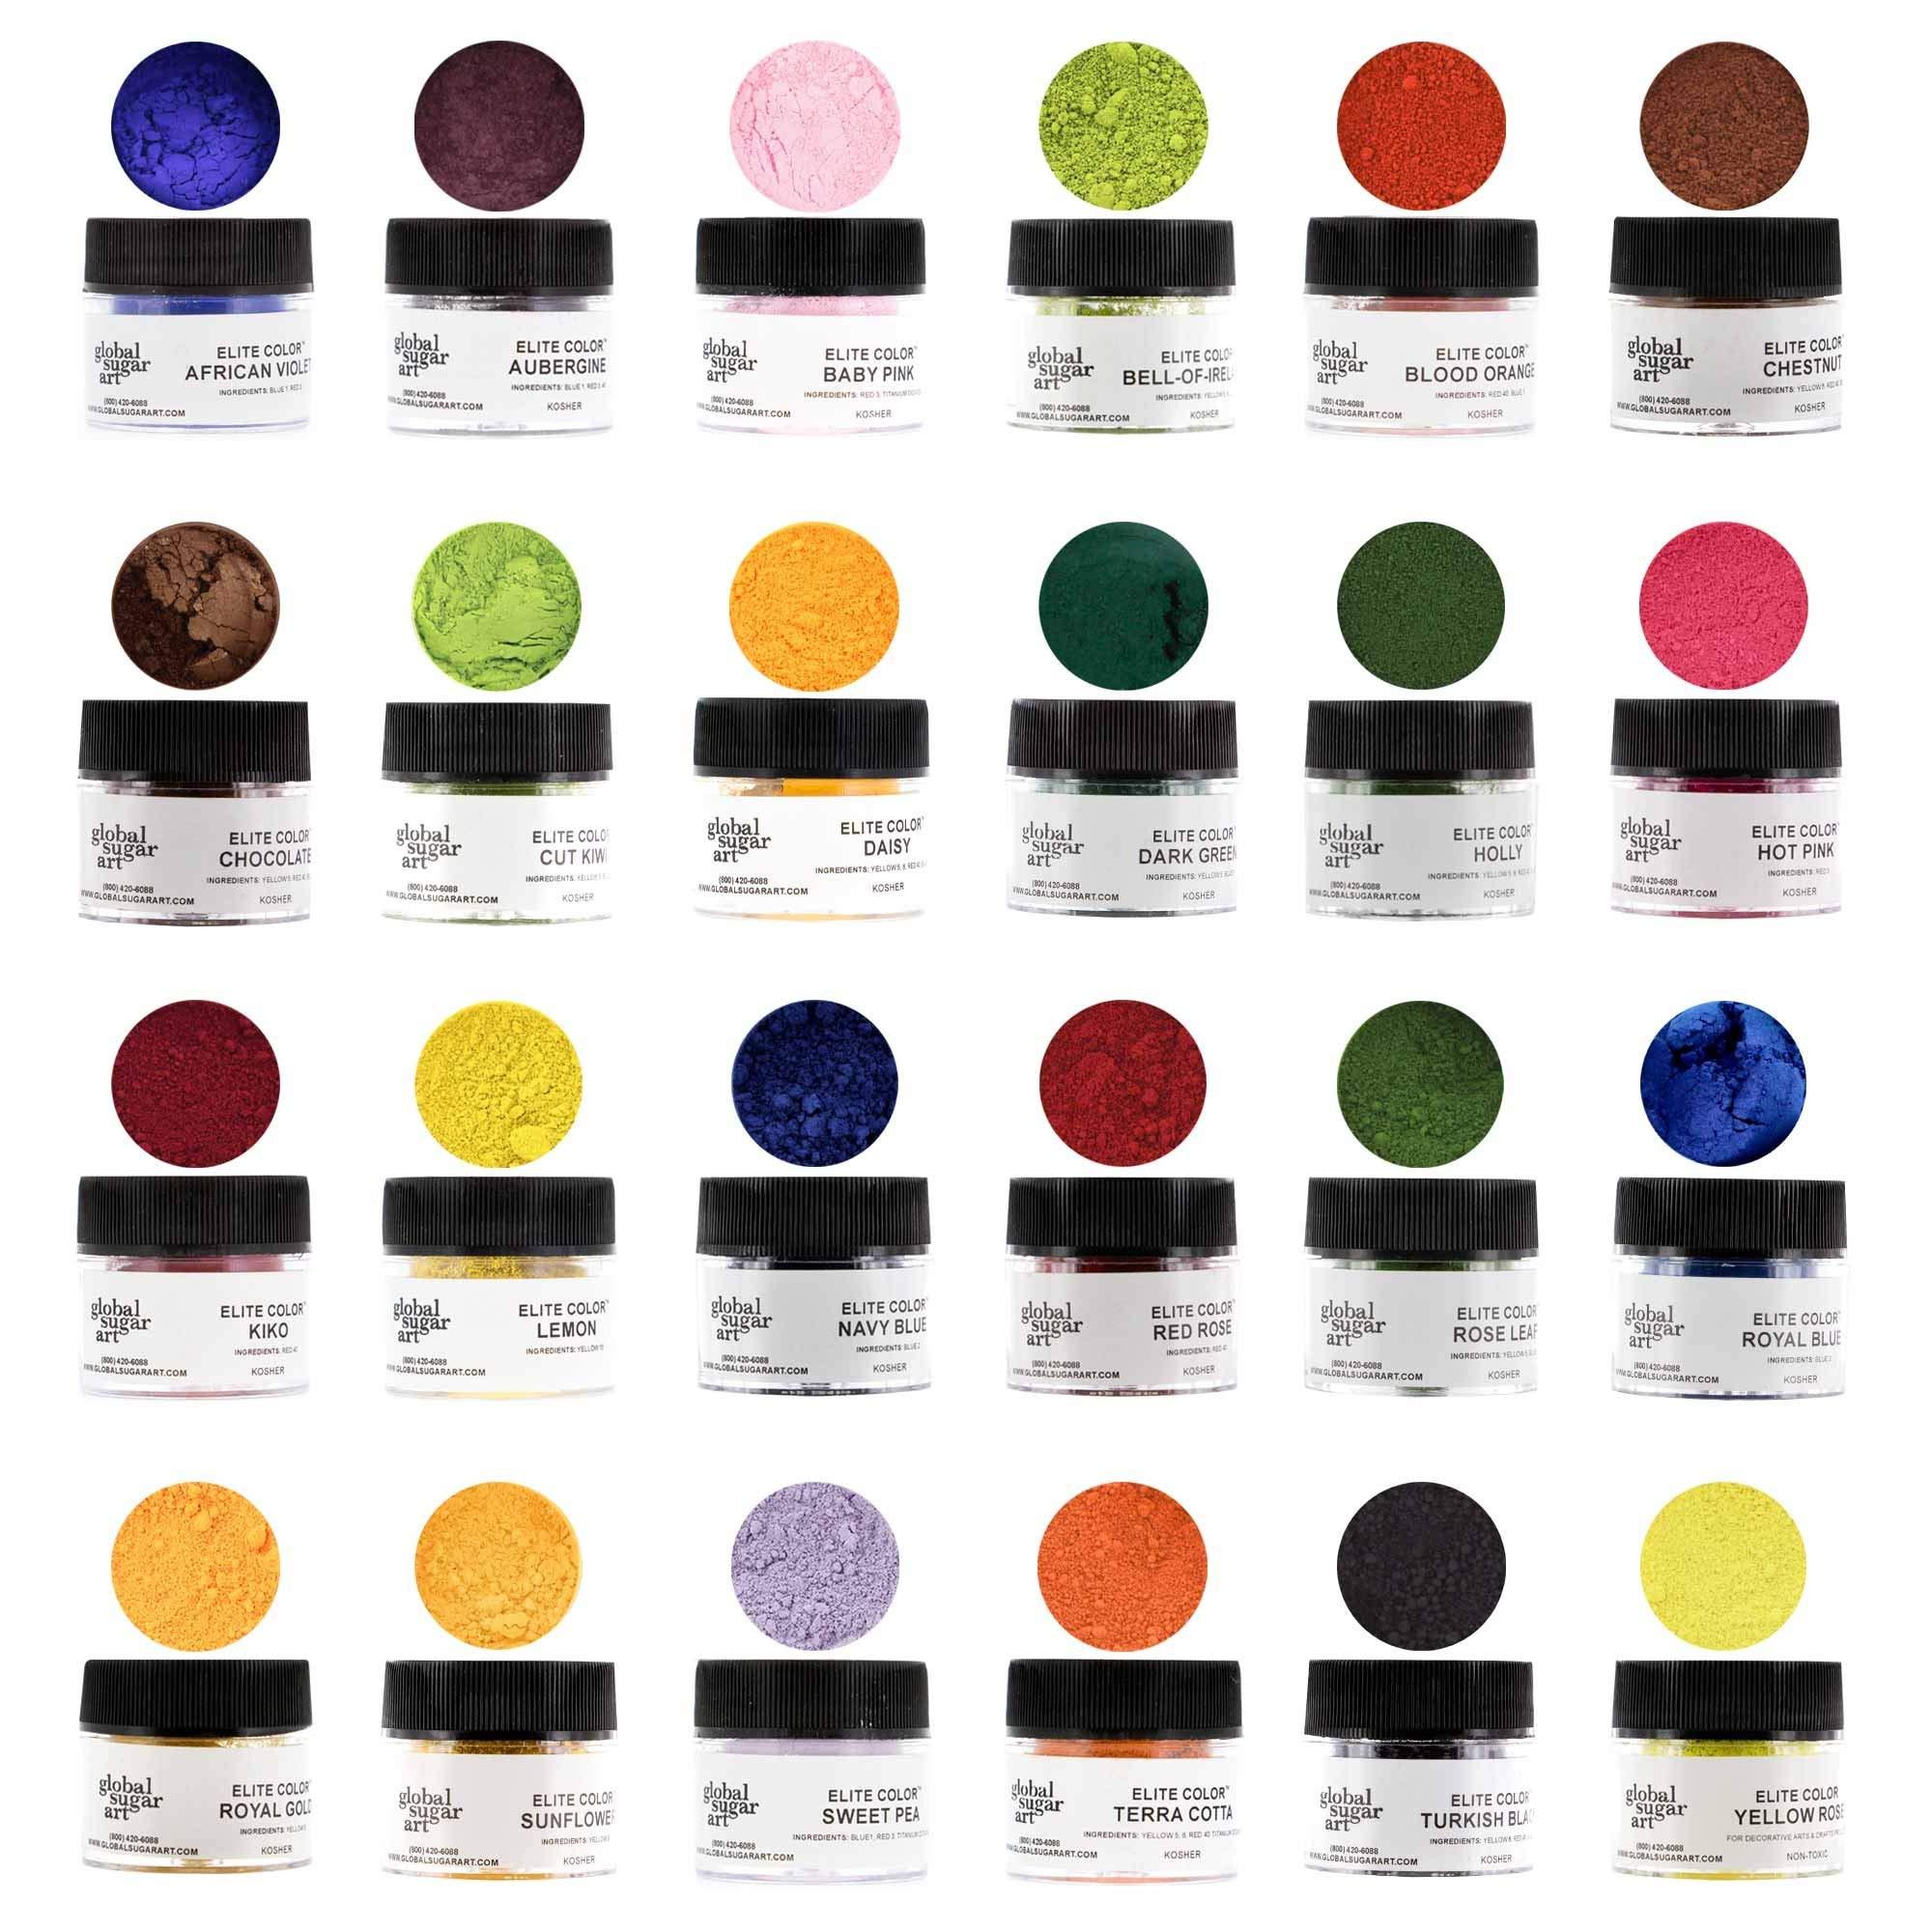 Master Premium Petal Dust Kit, 24 Color by Global Sugar Art by Global Sugar Art (Image #2)